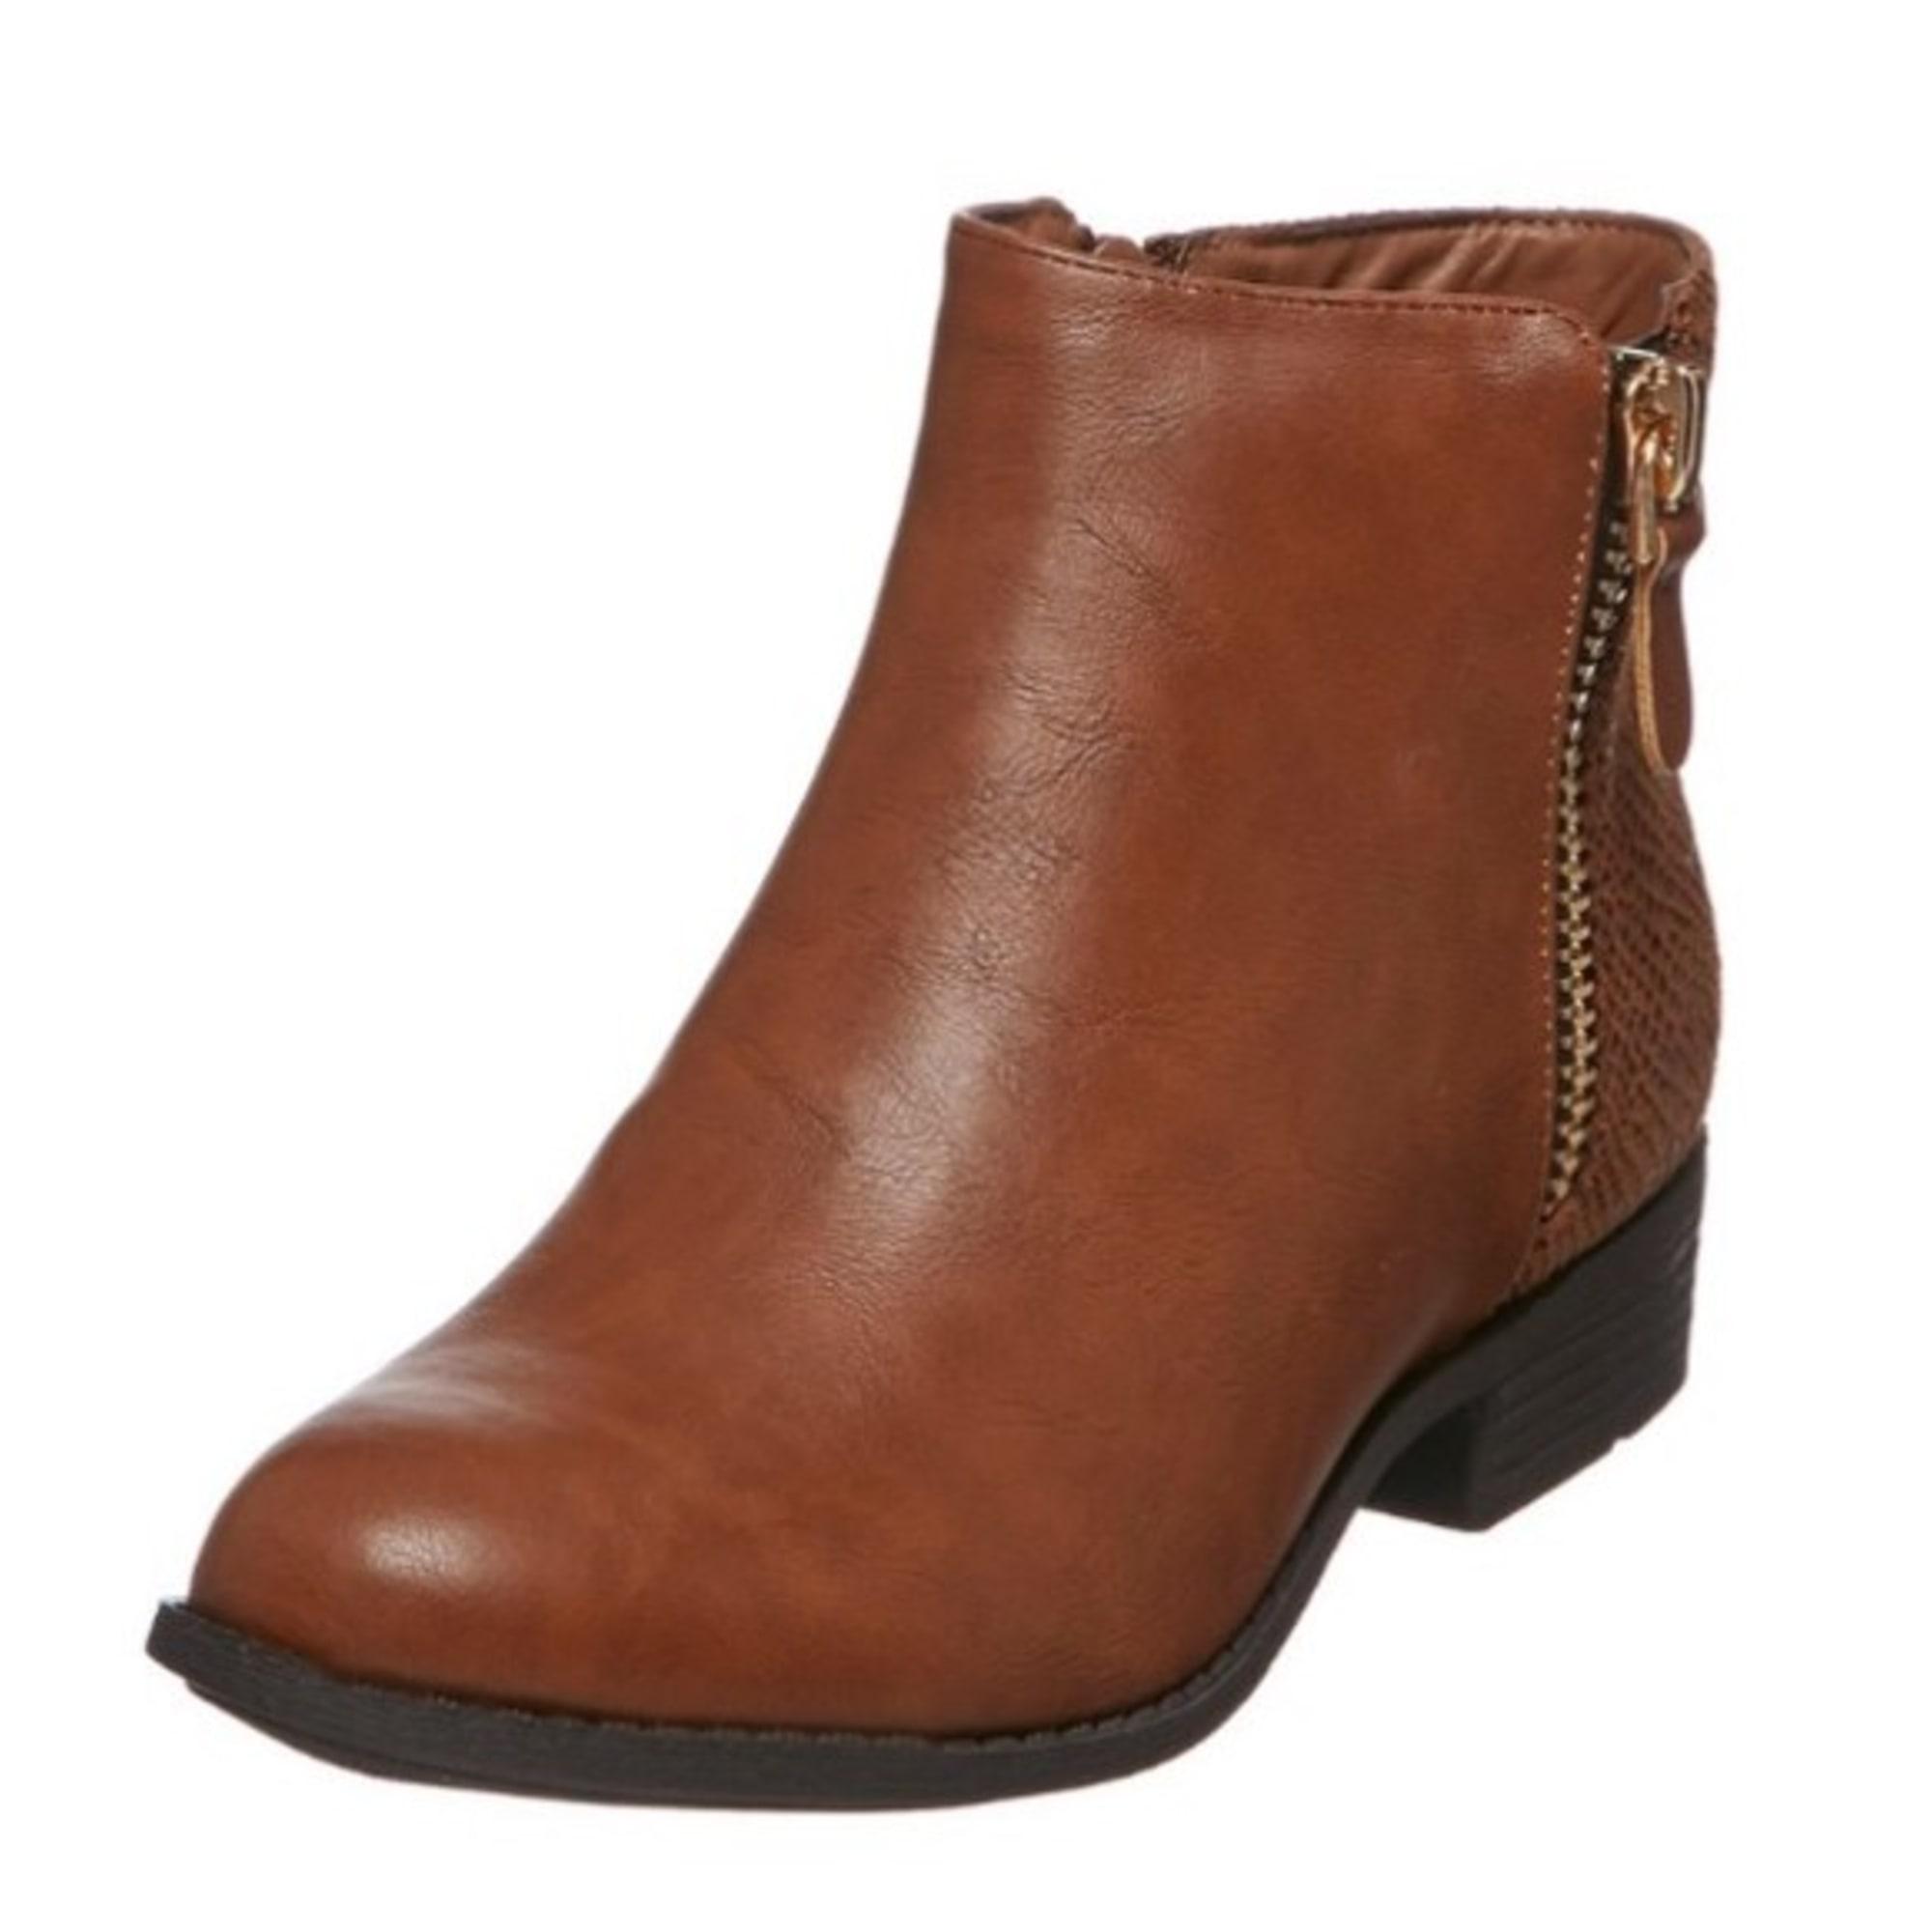 4f284dba396 Bottines   low boots à talons LILY SHOES 38 beige - 6920620